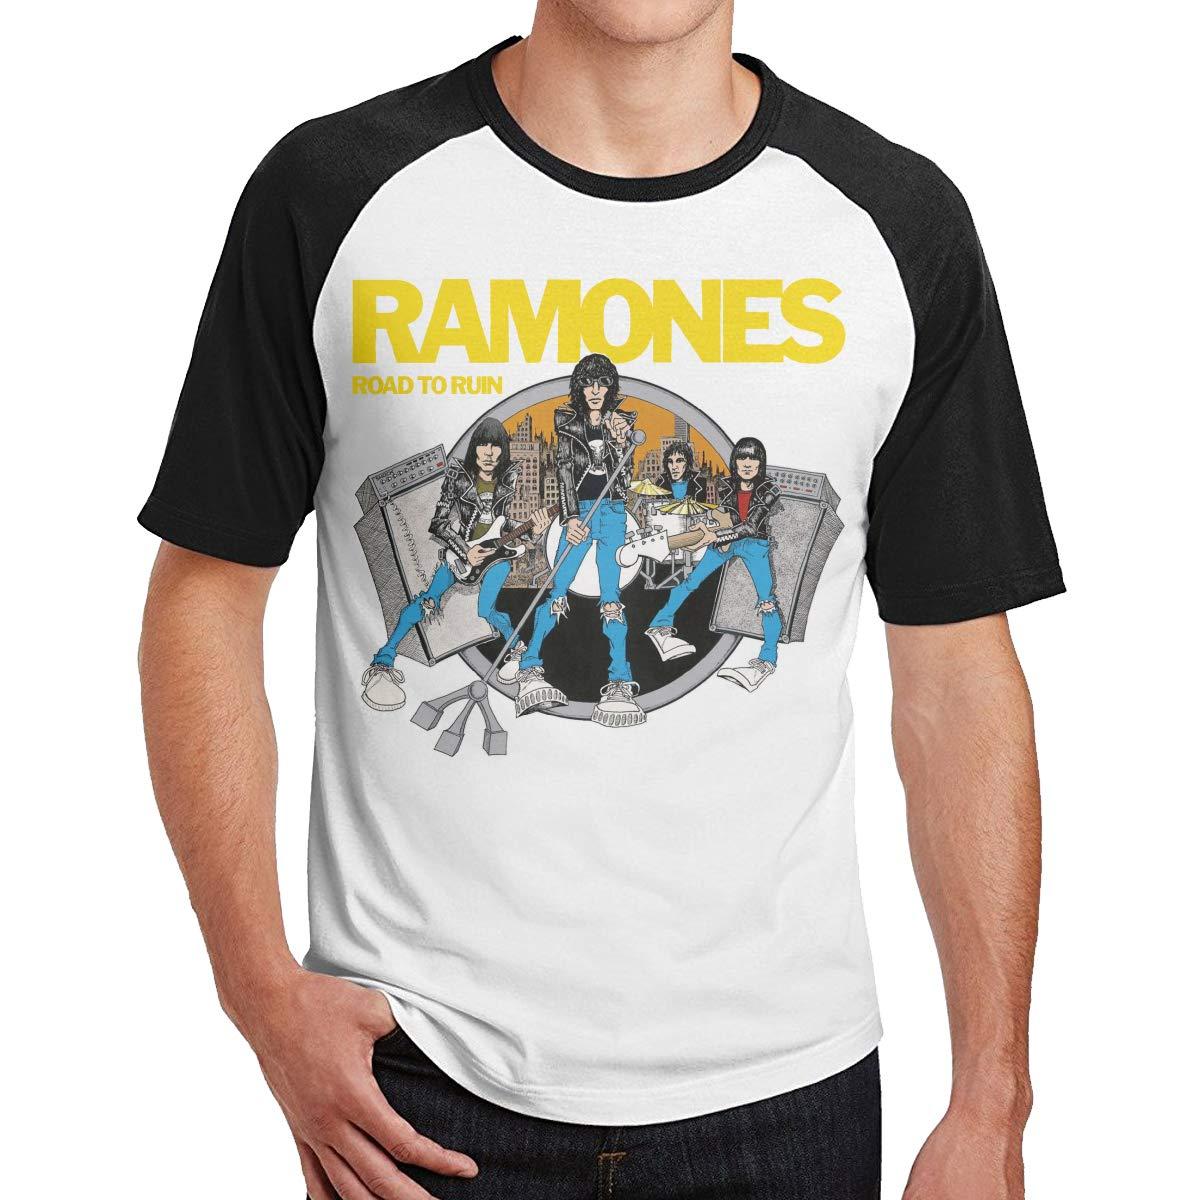 Road to Ruin Music Band Singer Short Sleeve Cool Baseball Shirt Ramones